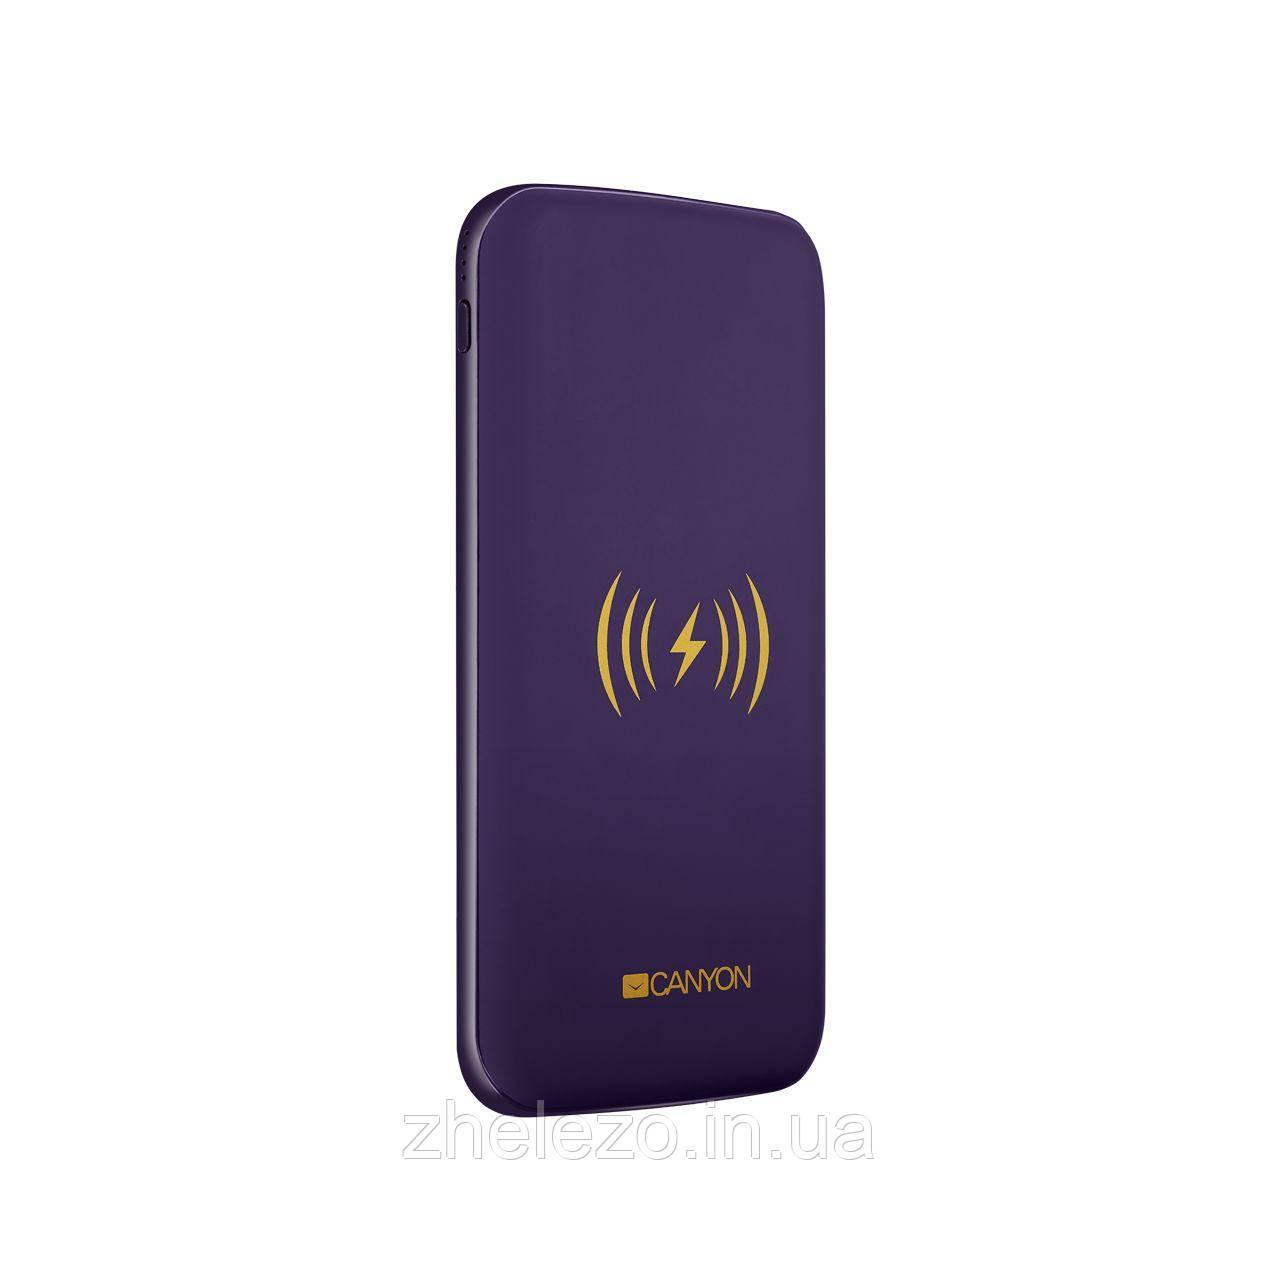 Беспроводное зарядное устройство Canyon CNS-TPBW8P Purple